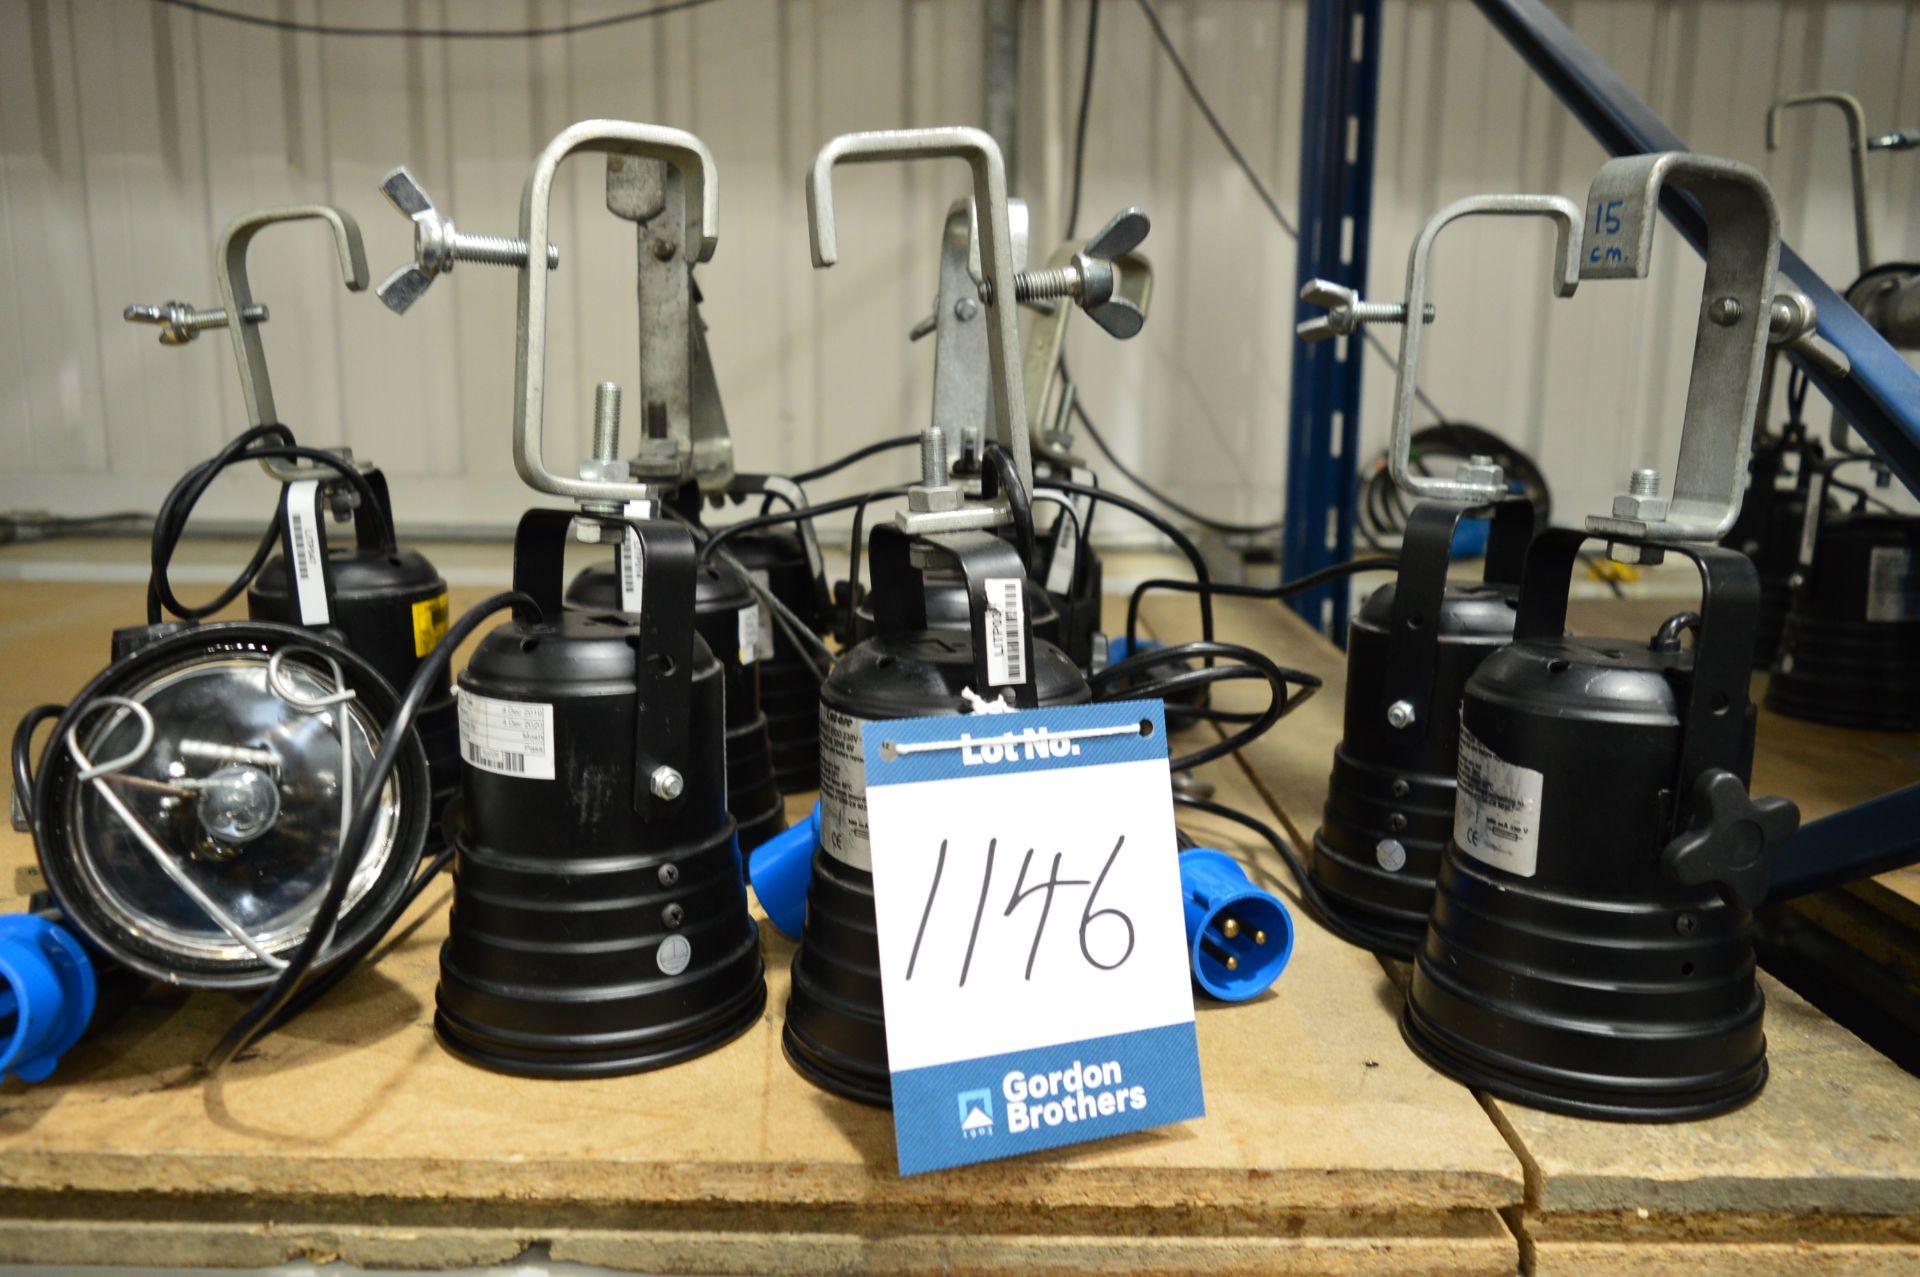 Lot 1146 - 10x No. Encore/DTS P36 short evo 230v lamps with b